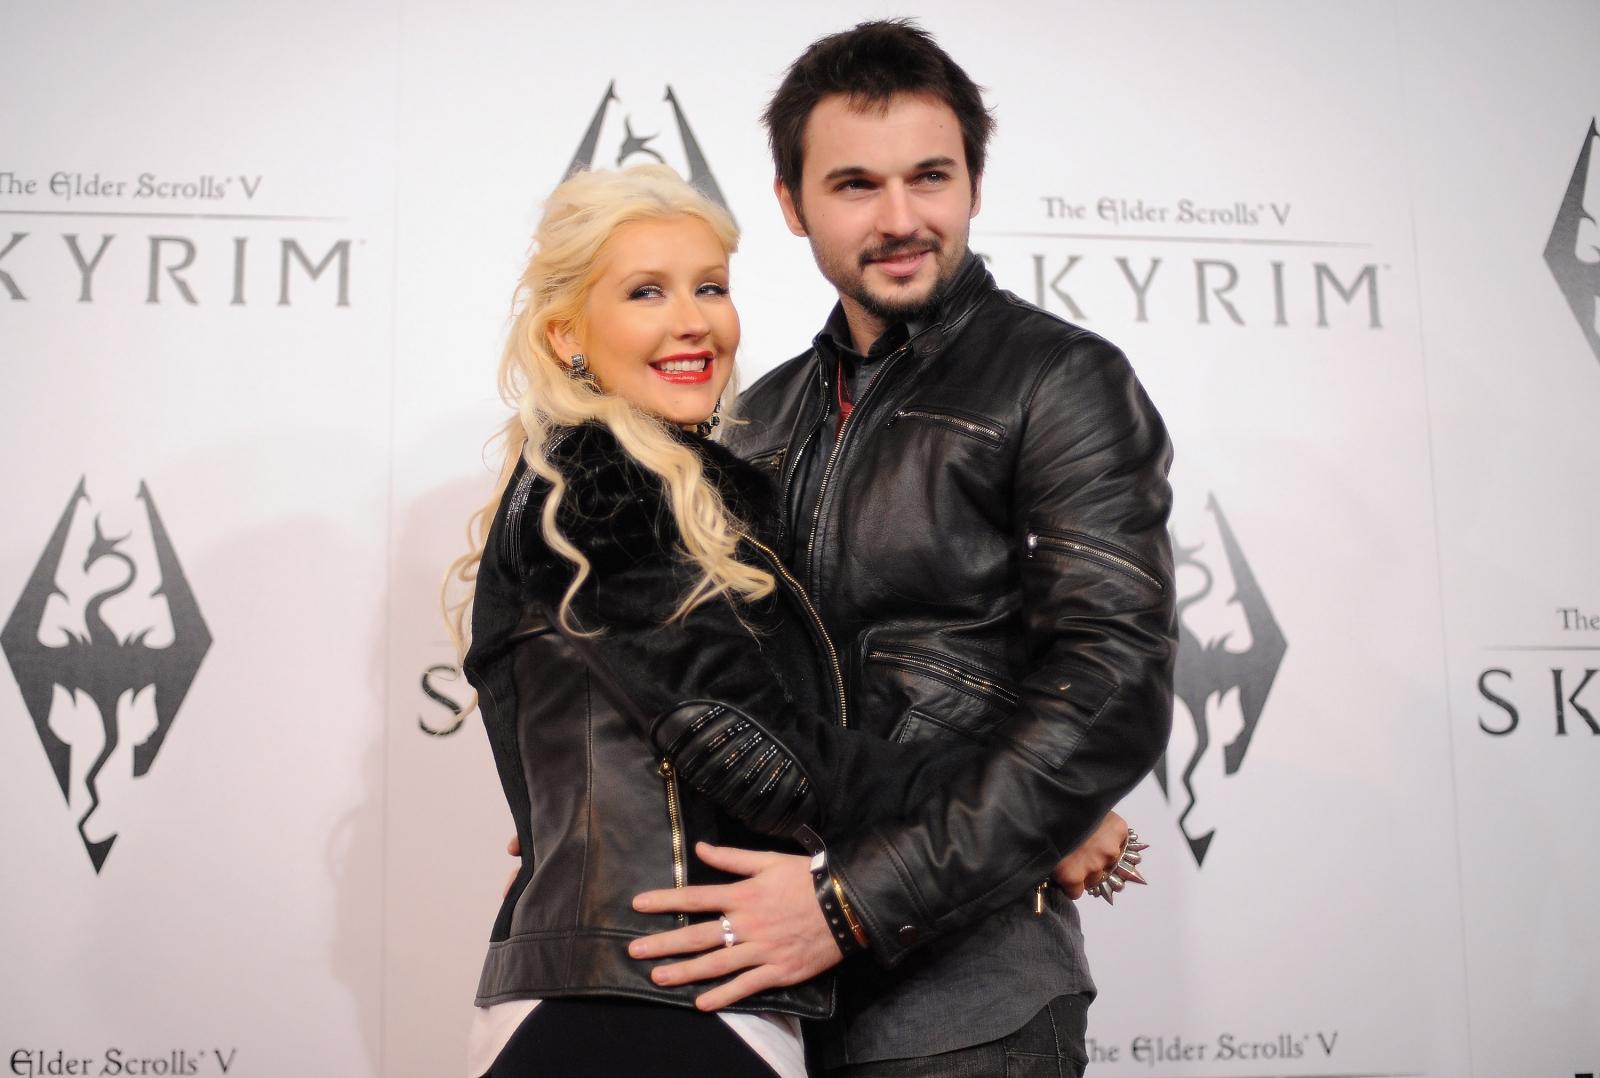 Christina Aguilera and Mark Rutler